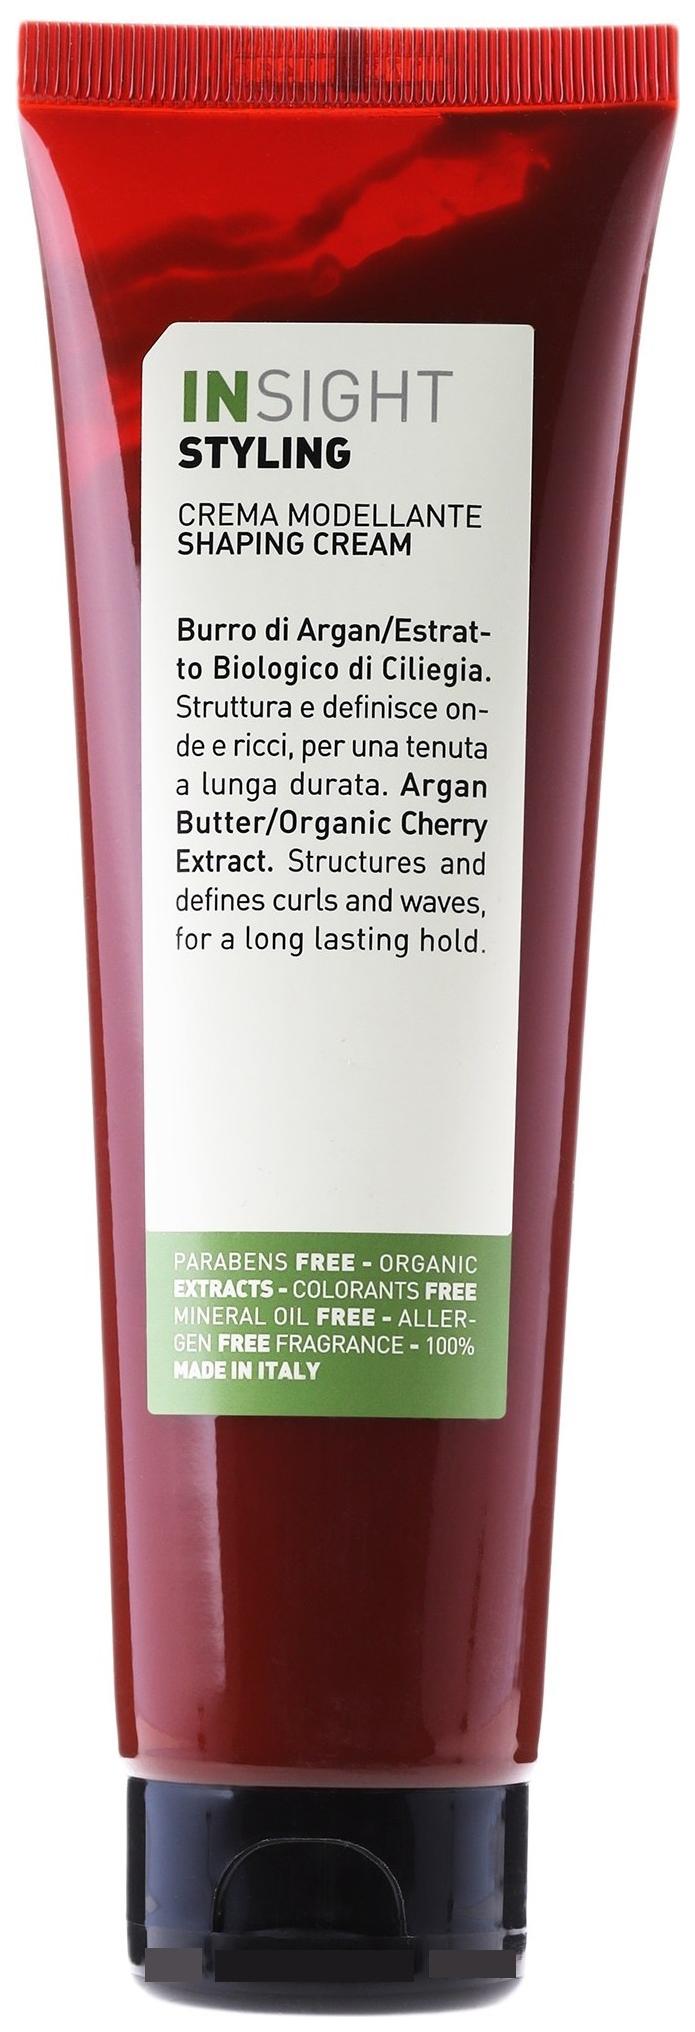 Средство для укладки волос Insight Styling Shaping